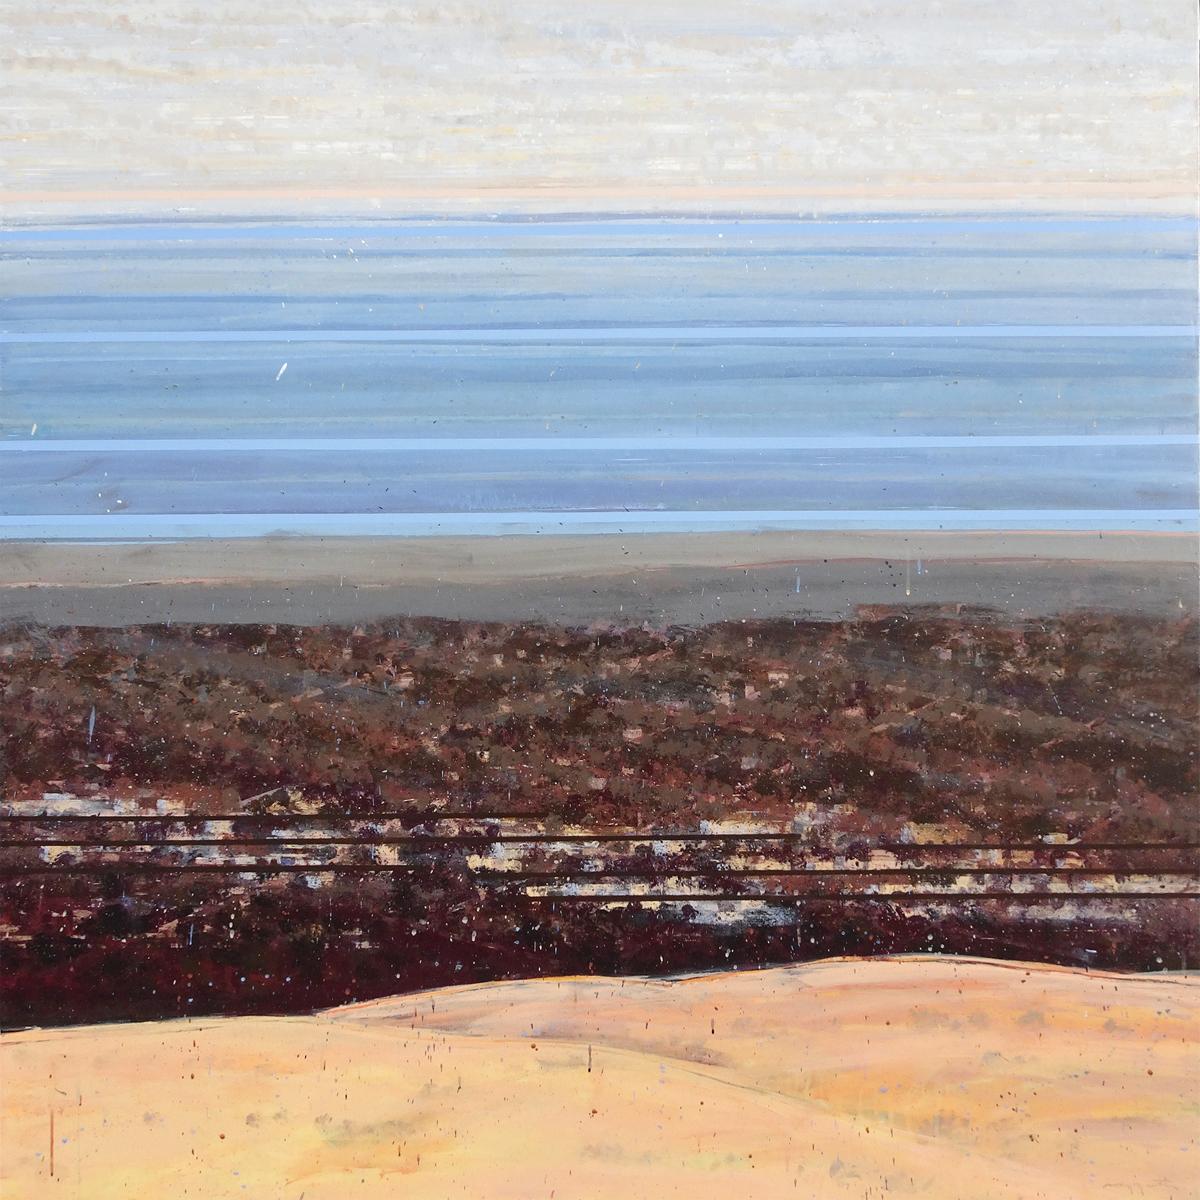 Peninsula Patterns (large view)